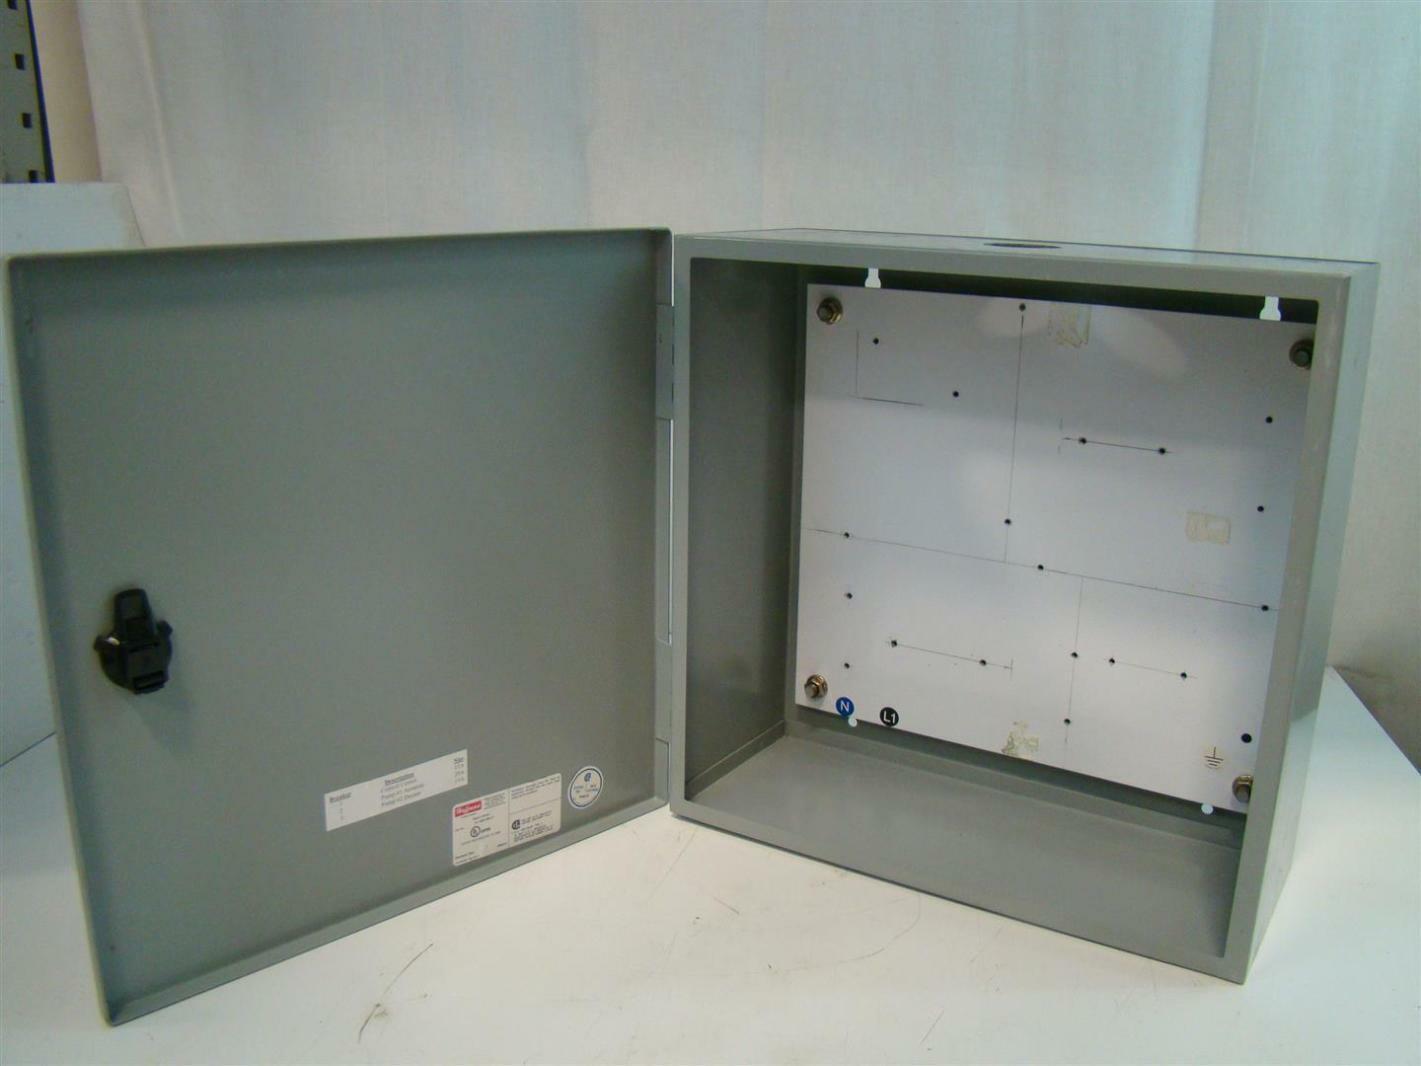 fuse box or breaker box hoffman cutout box ac-5646 a-16n16alp | ebay hoffman fuse box #6